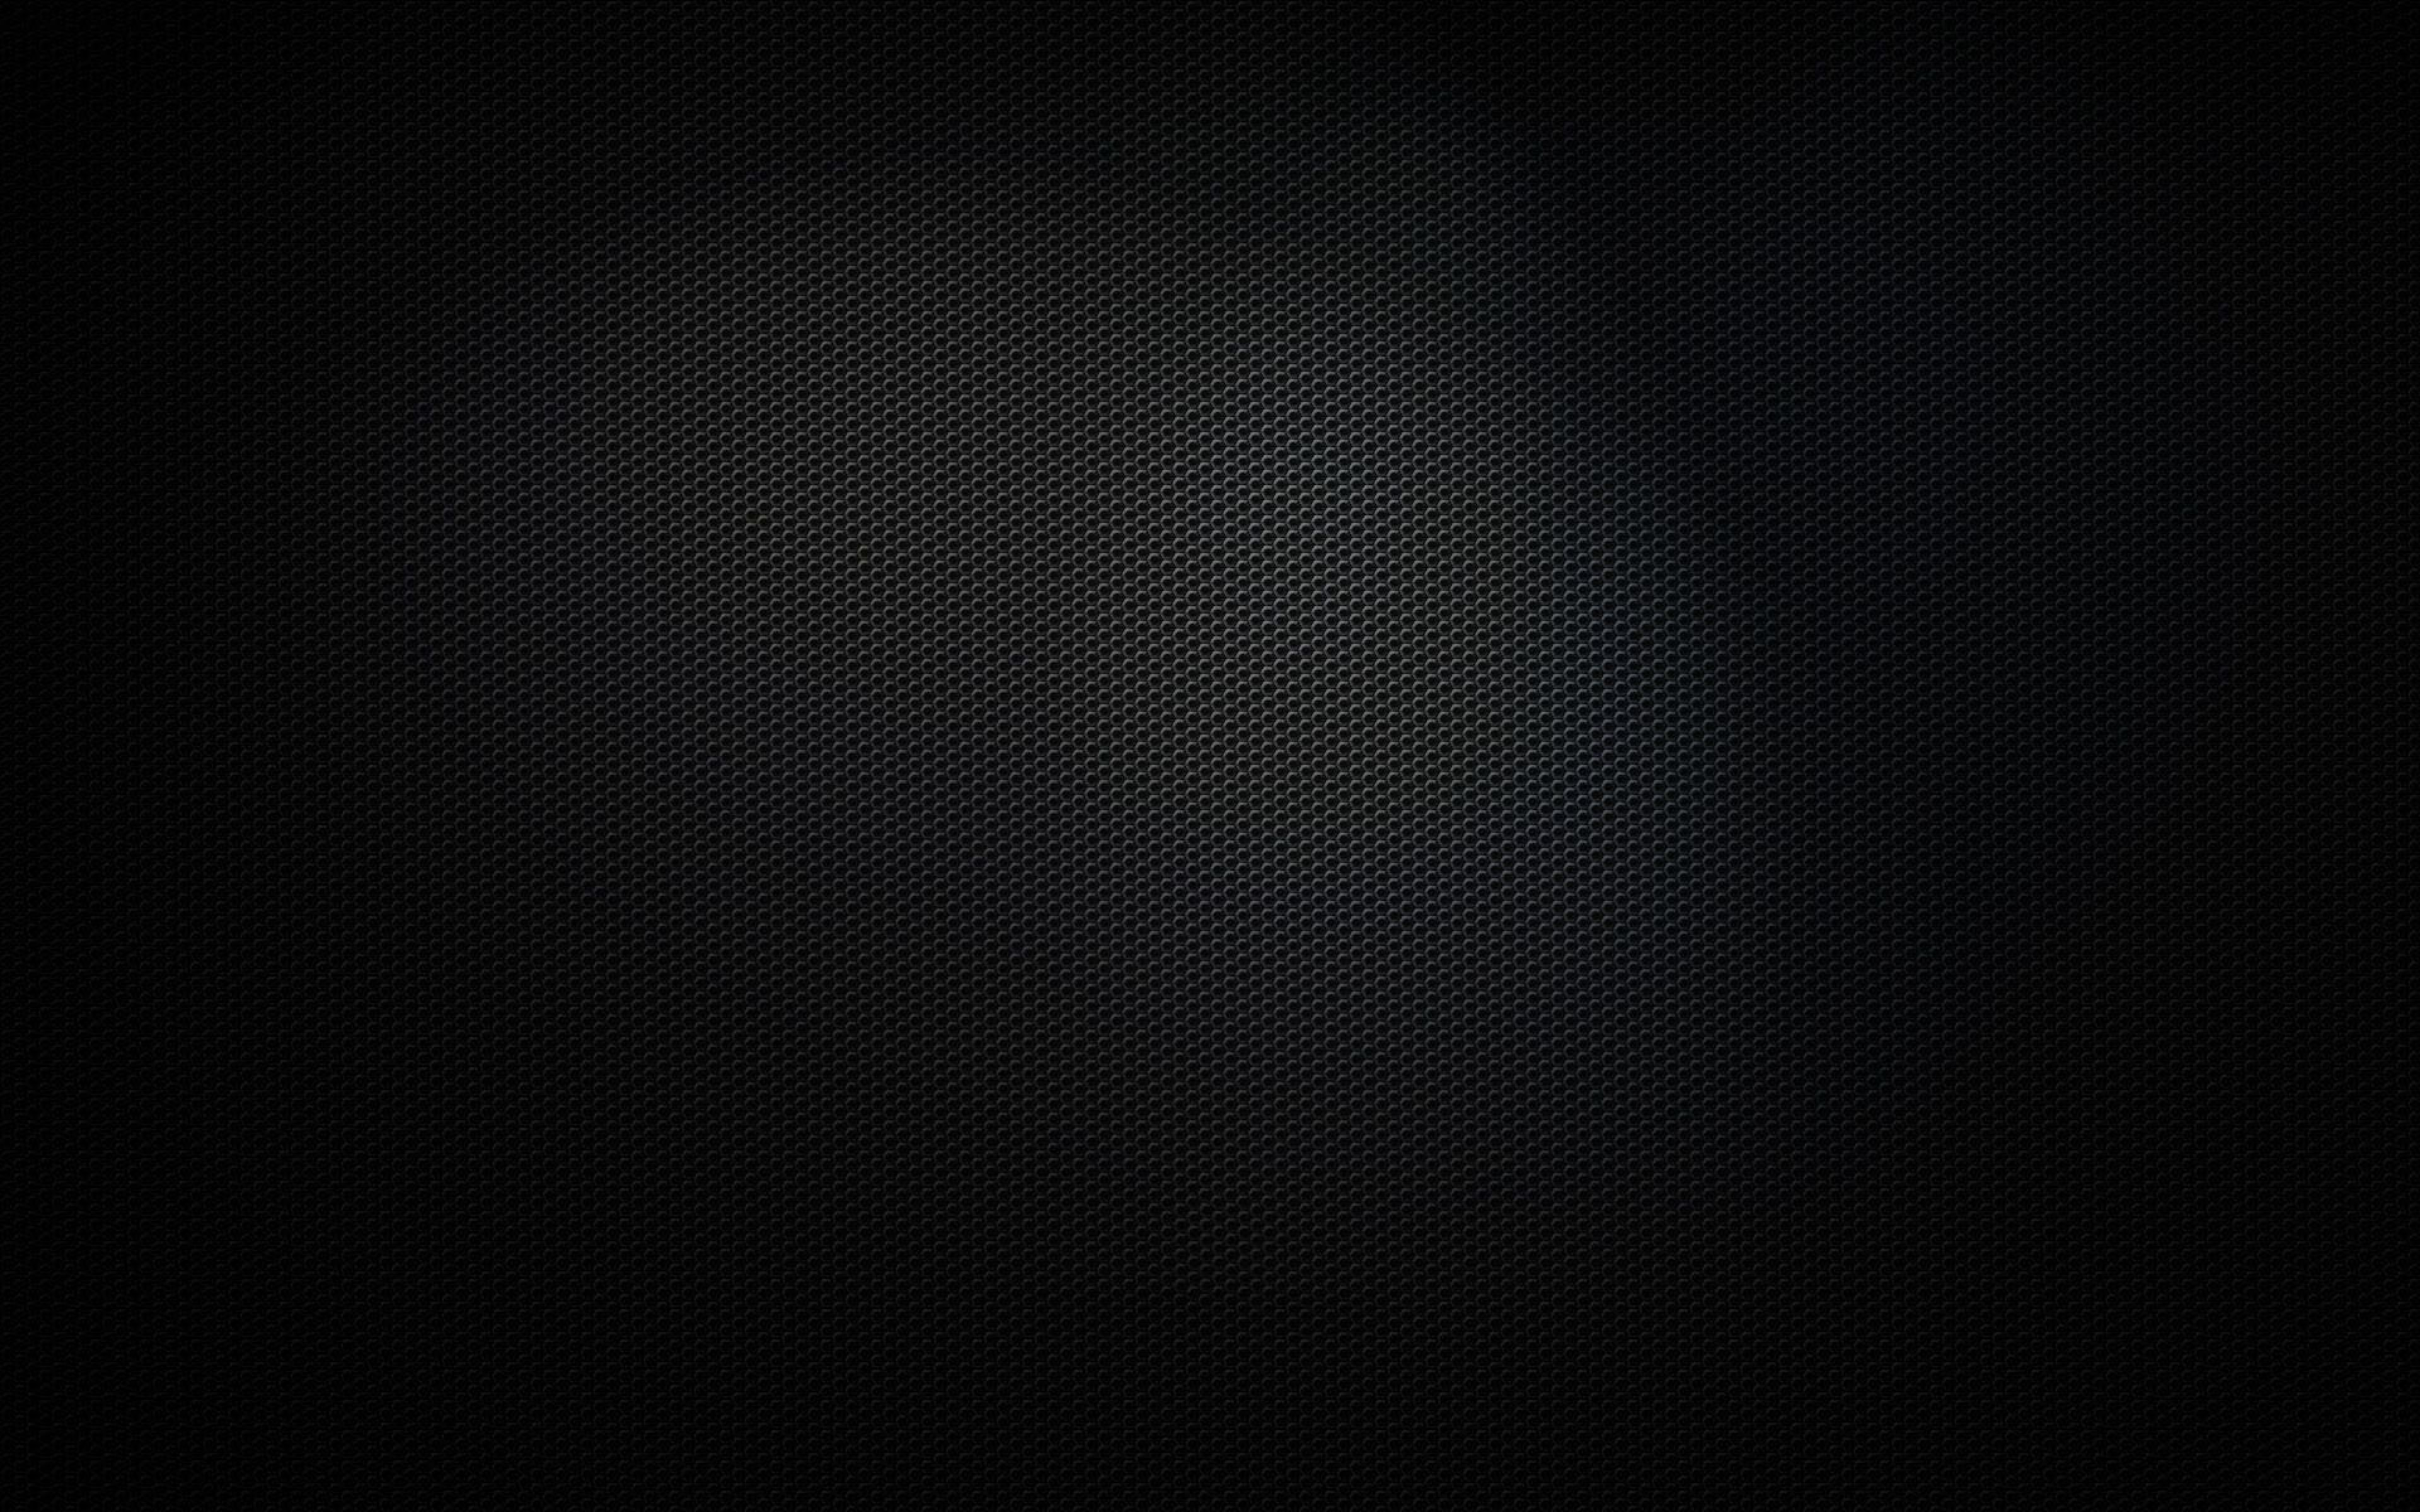 Download Wallpaper 3840x2400 Carbon Material Dark Shape Surface 3840x2400